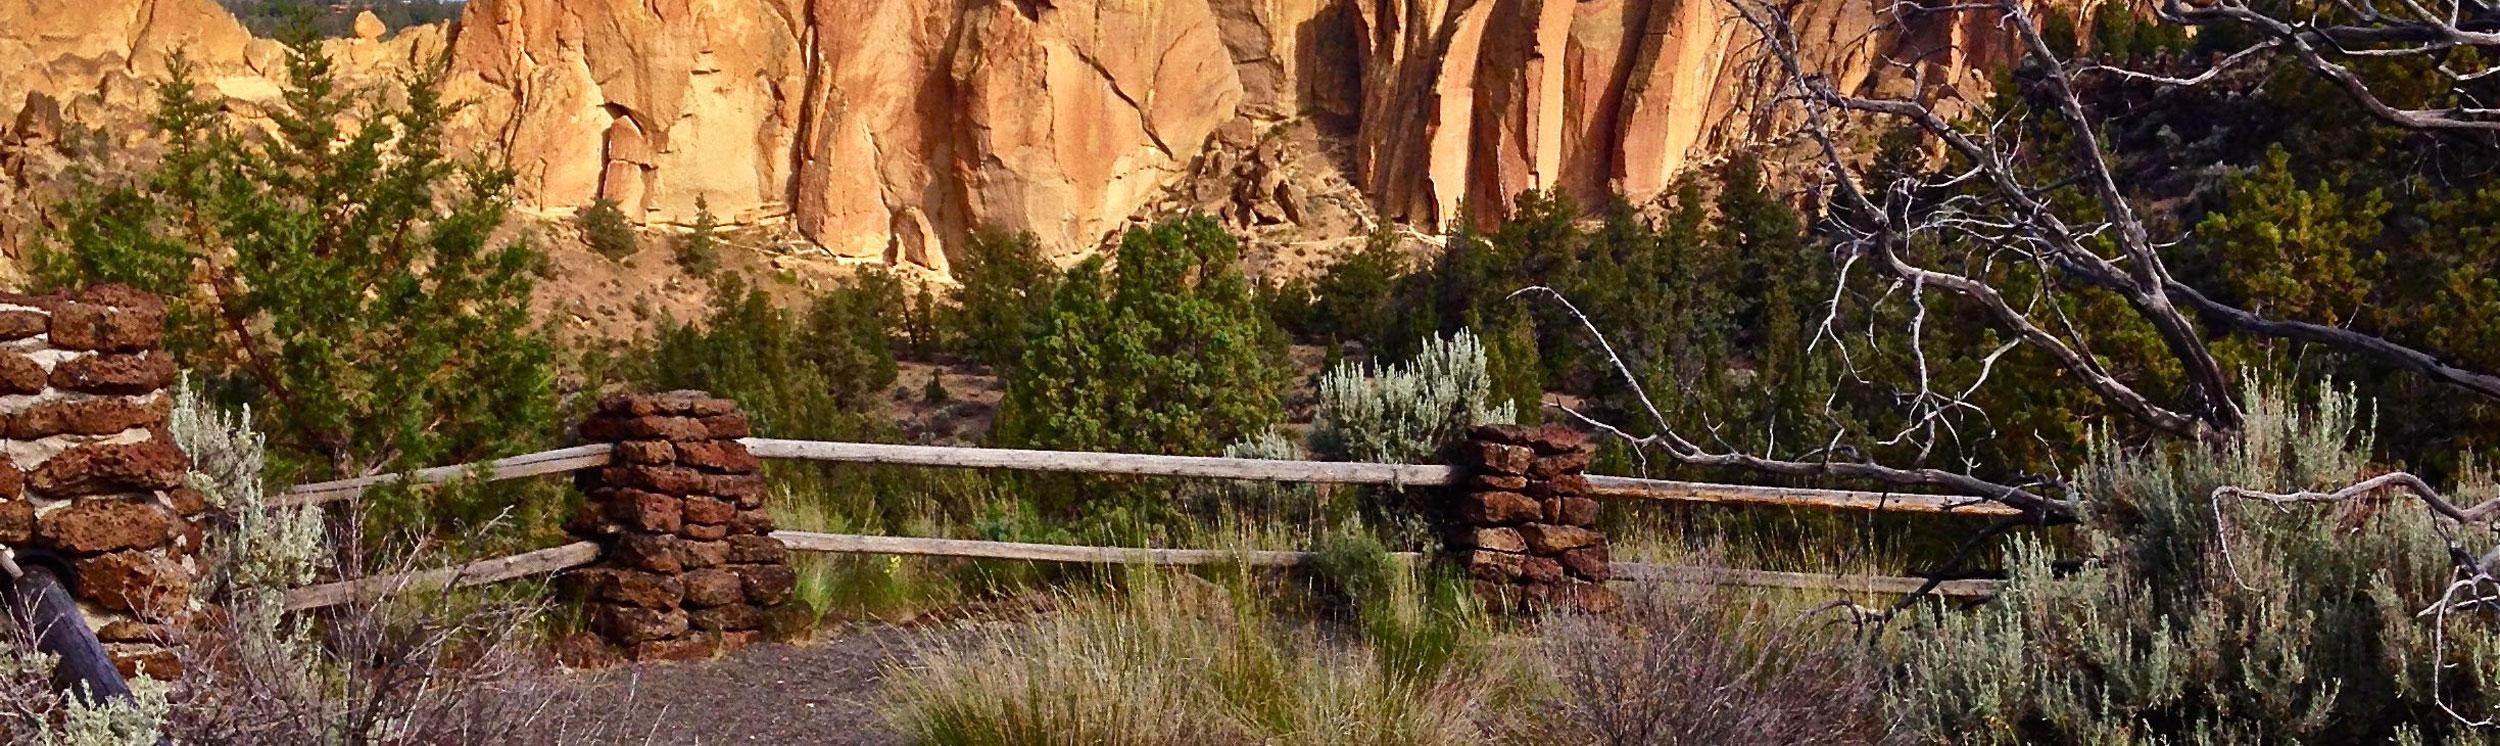 rim rock trail run - extension